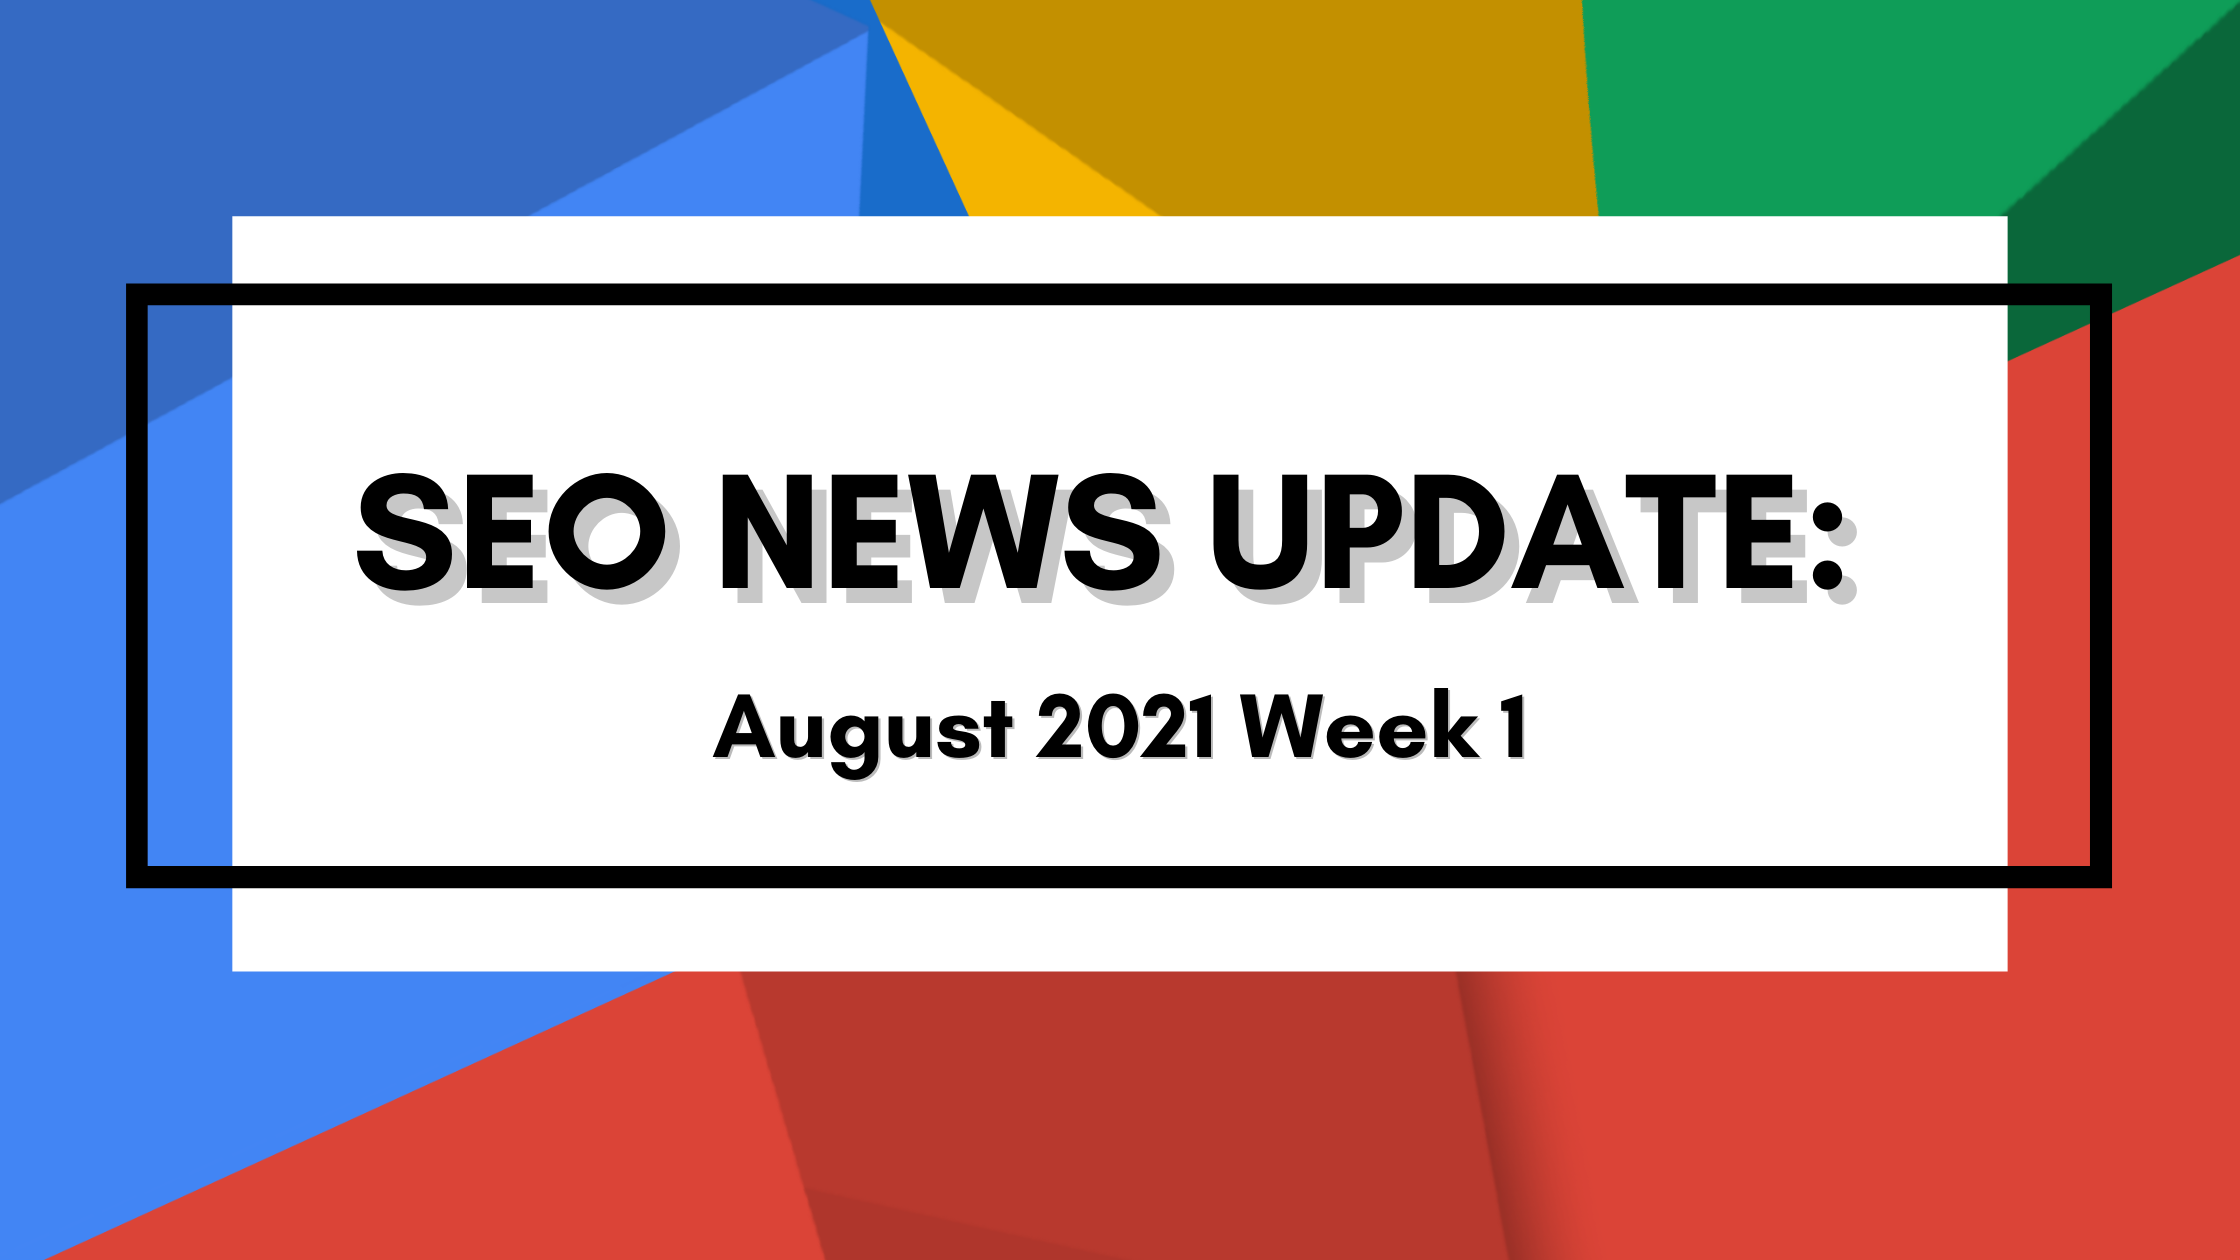 SEO News Update August 2021 Week 1